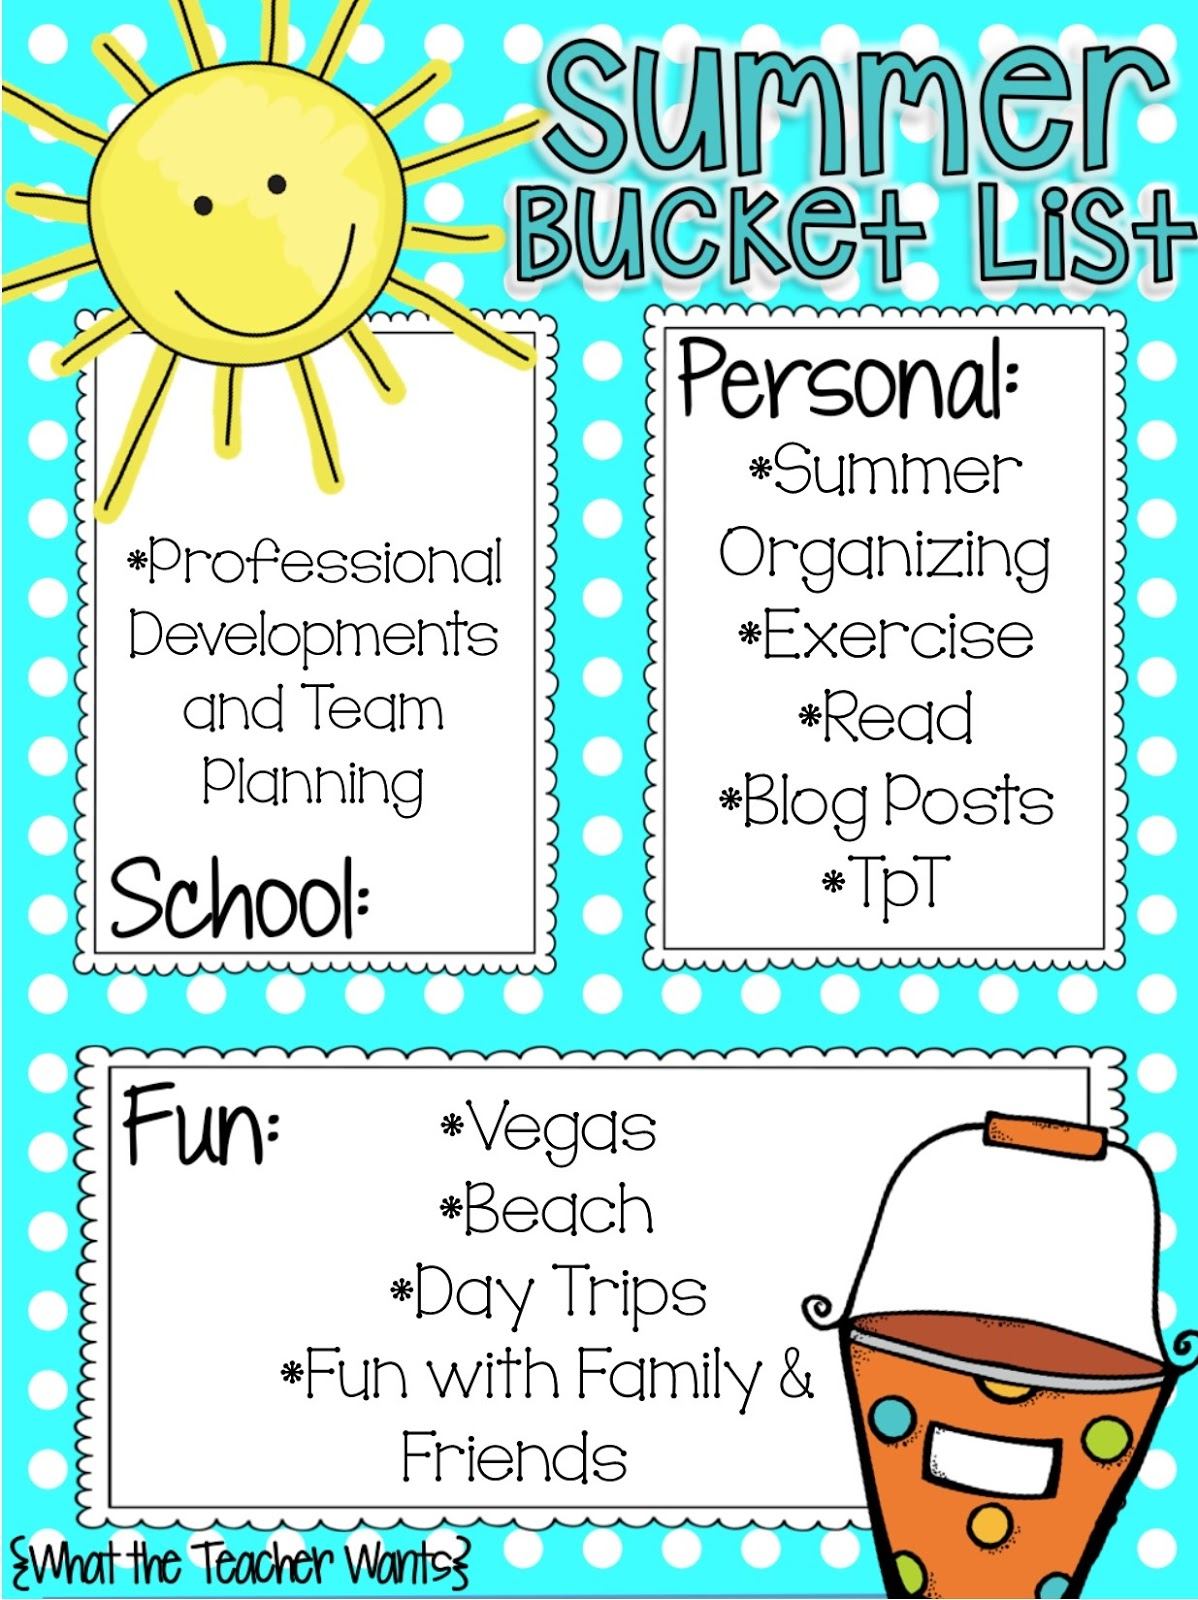 Summer Bucket List - Recipe for Teaching